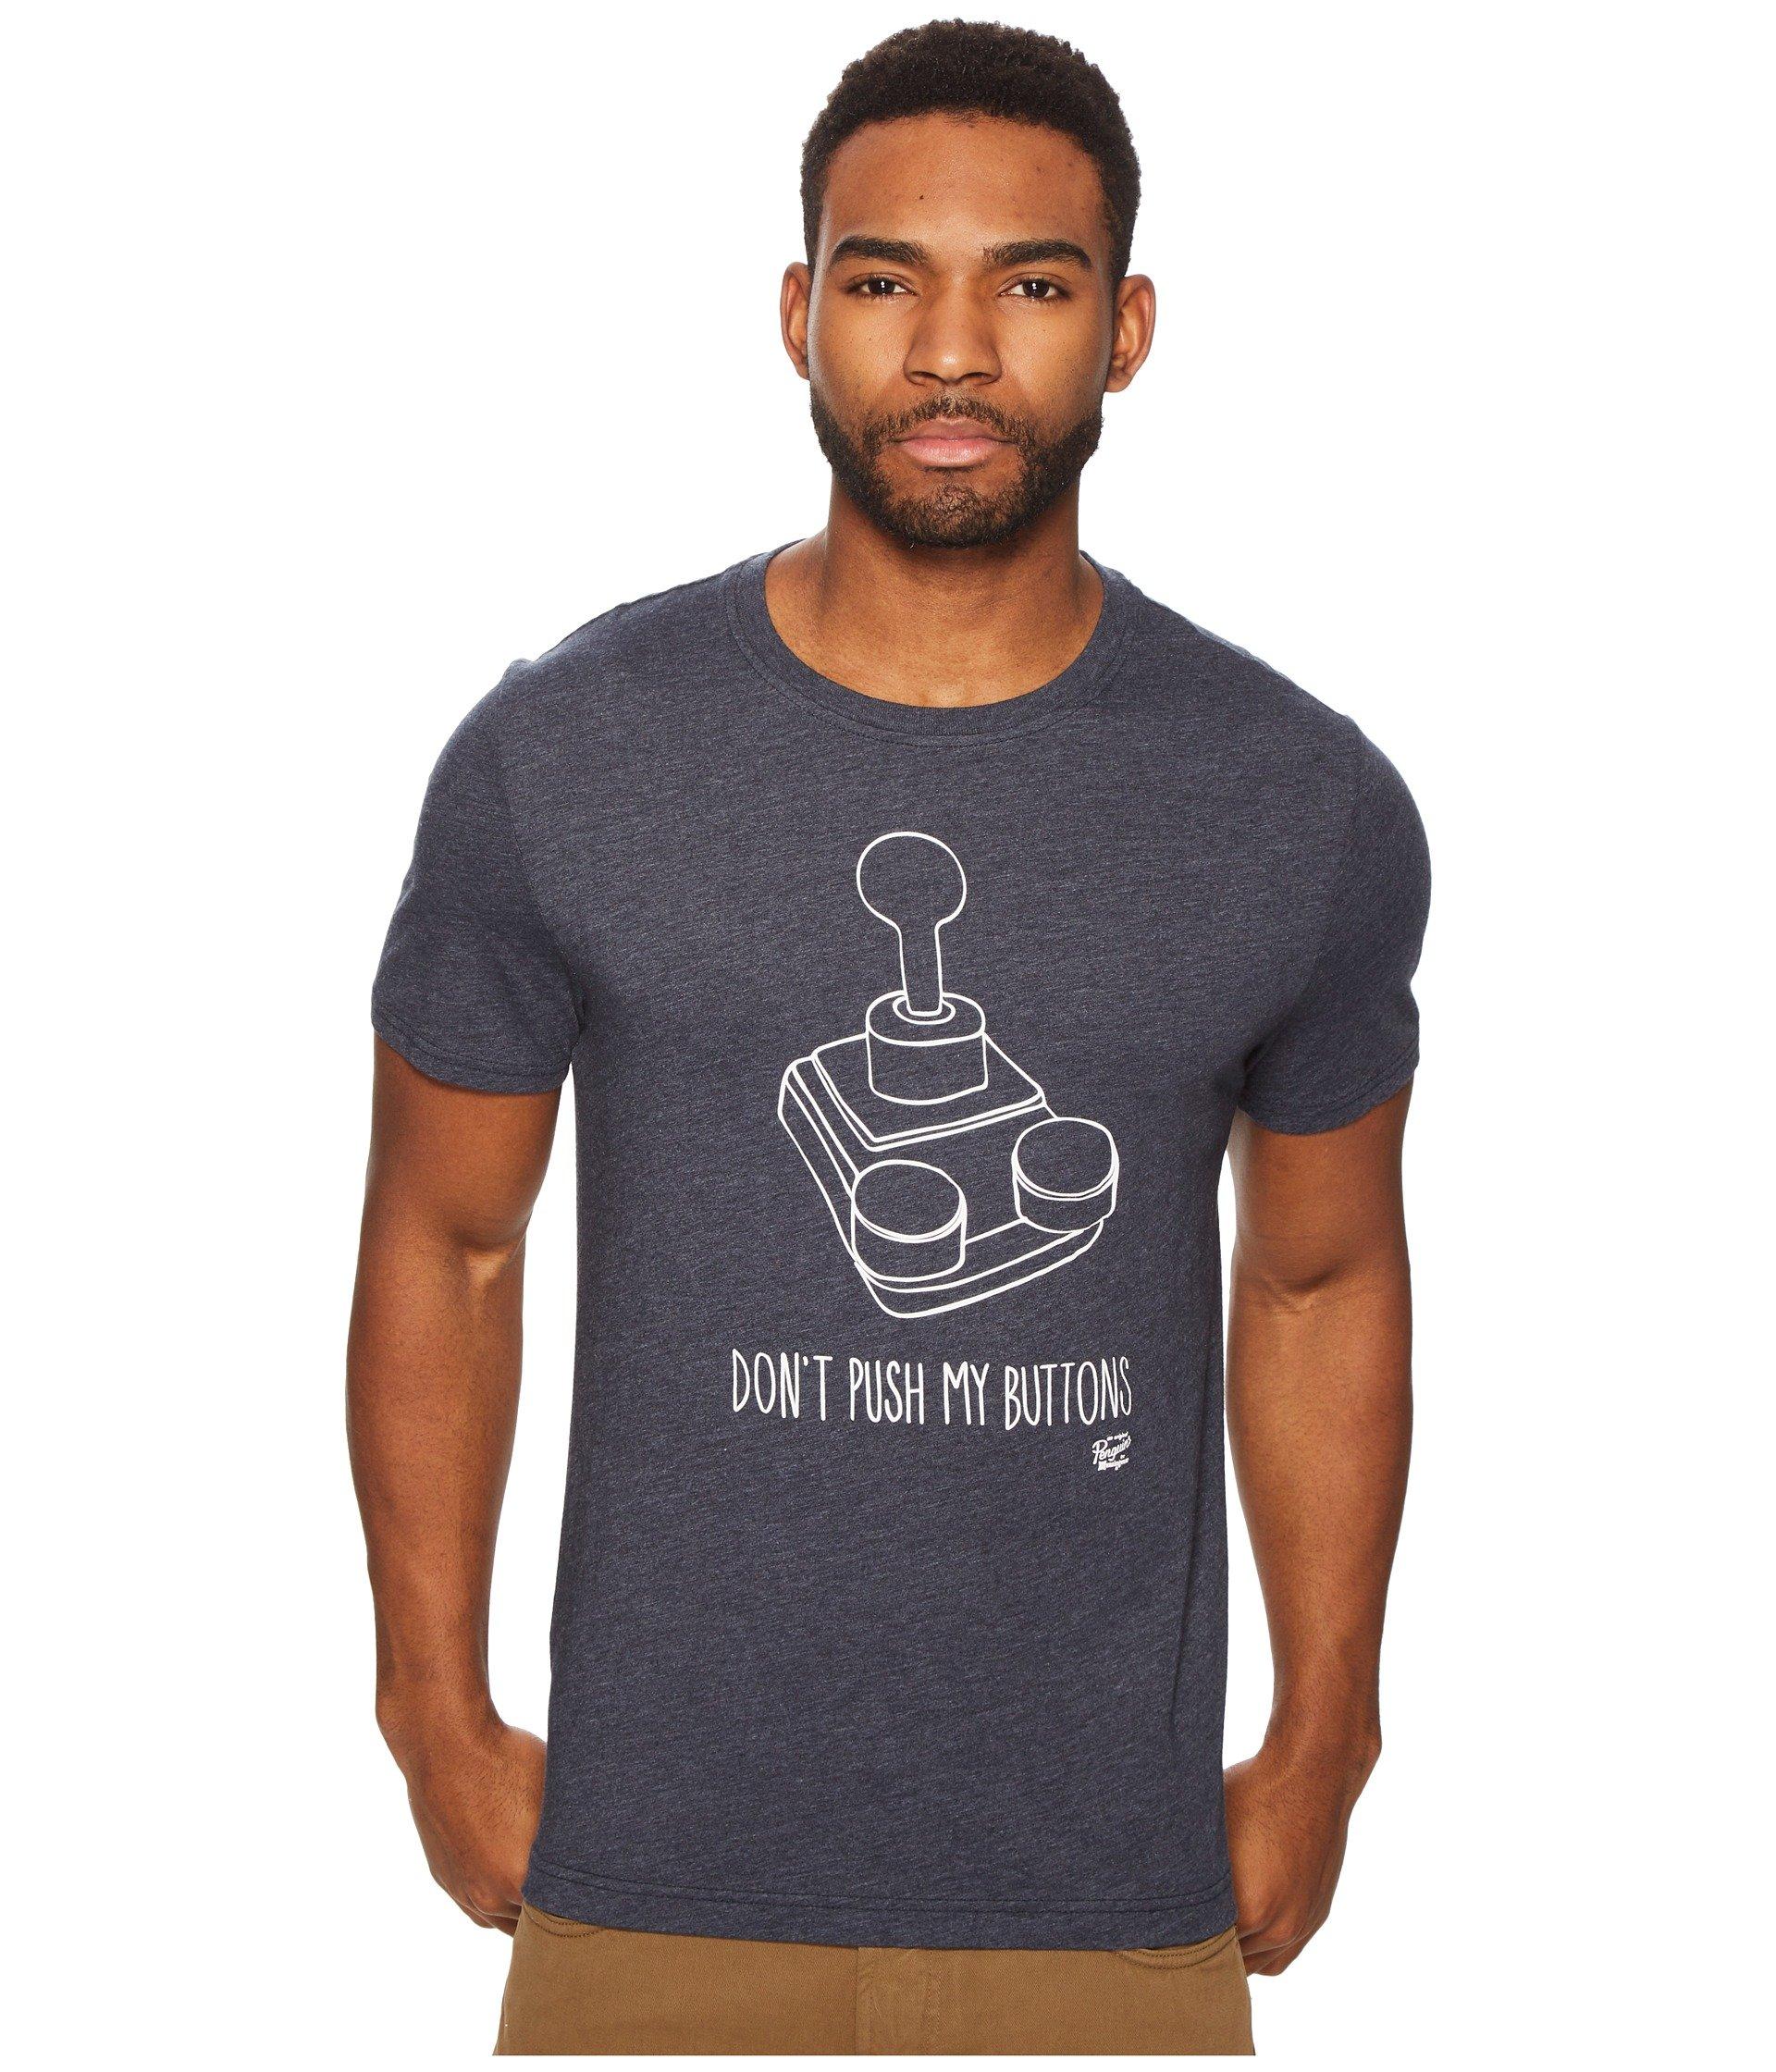 Camiseta para Hombre Original Penguin Donand#39;t Push My Buttons Tee  + Original Penguin en VeoyCompro.net